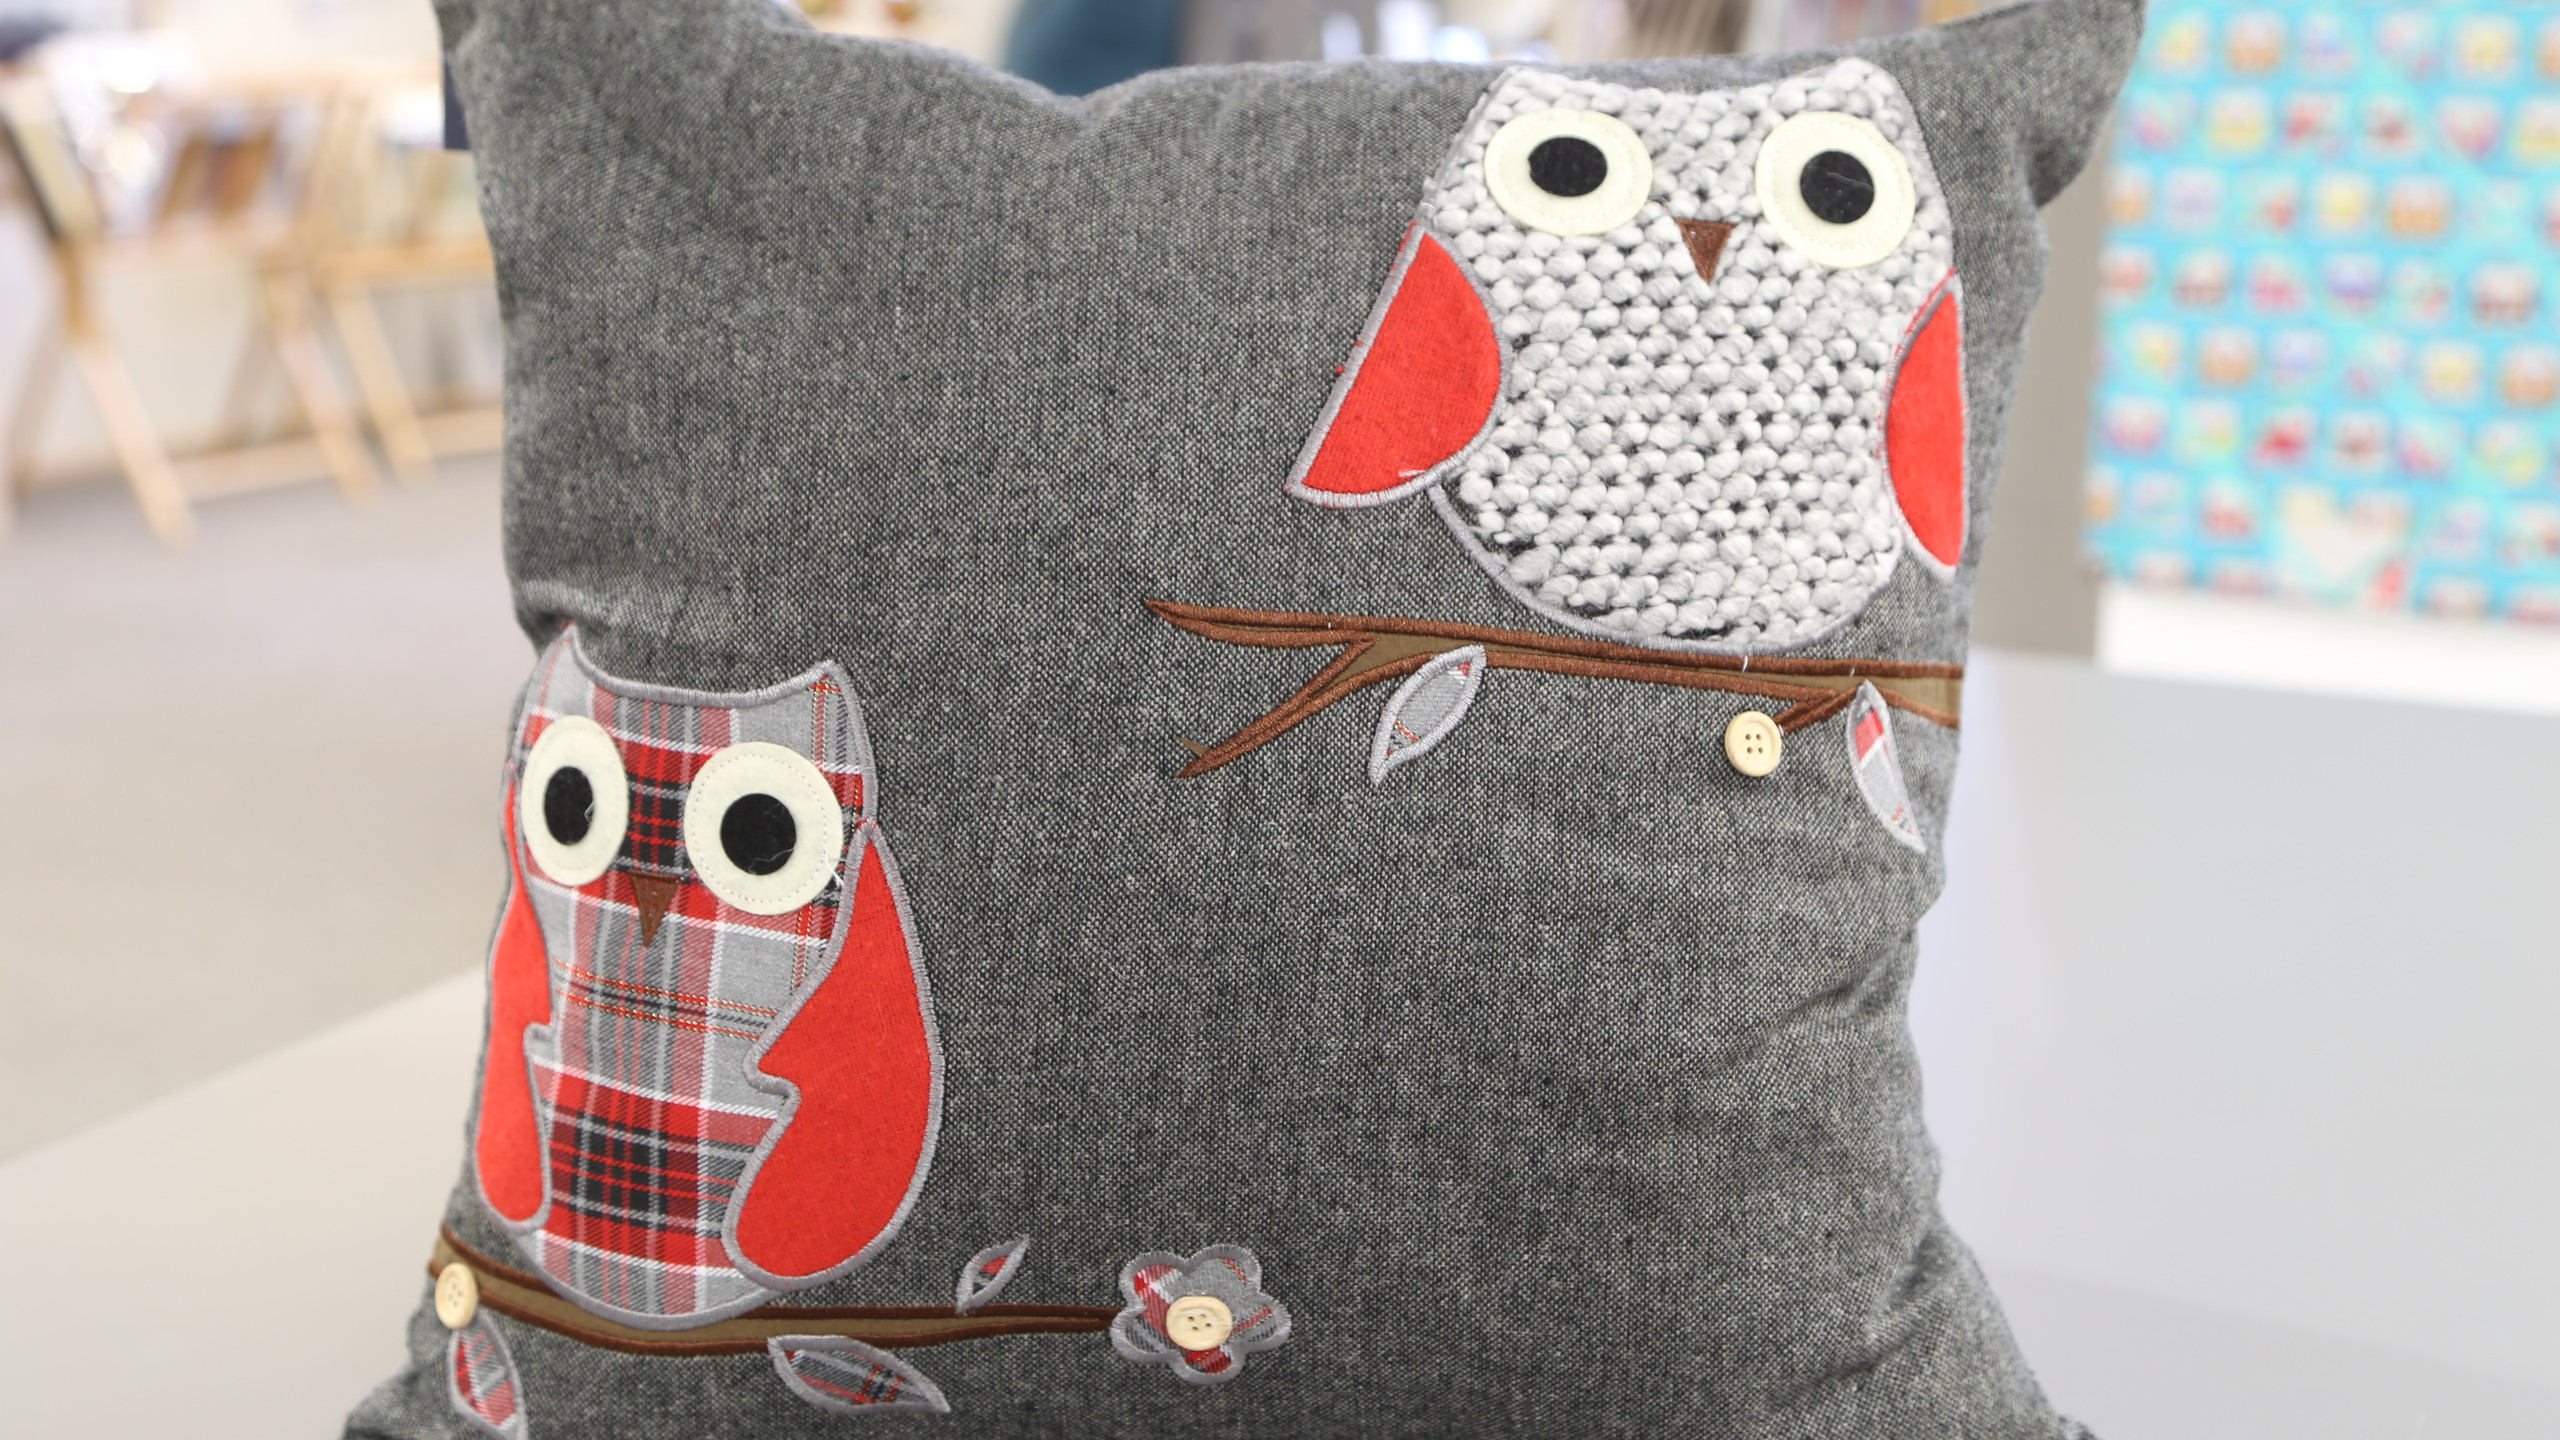 Red Owl cushion